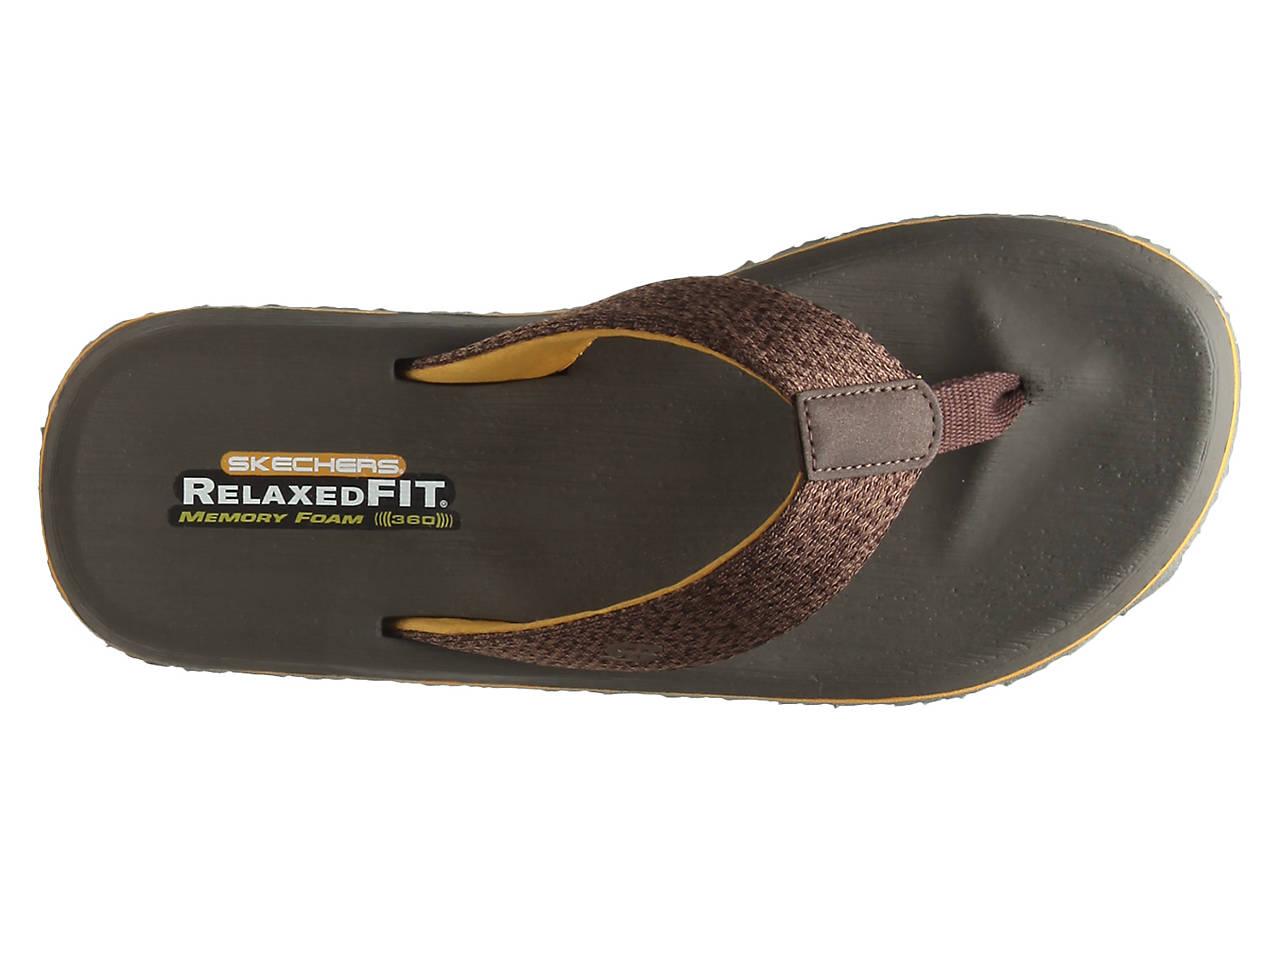 d746a49faf93 Skechers Relaxed Fit Tantric Ravel Flip Flop Men s Shoes